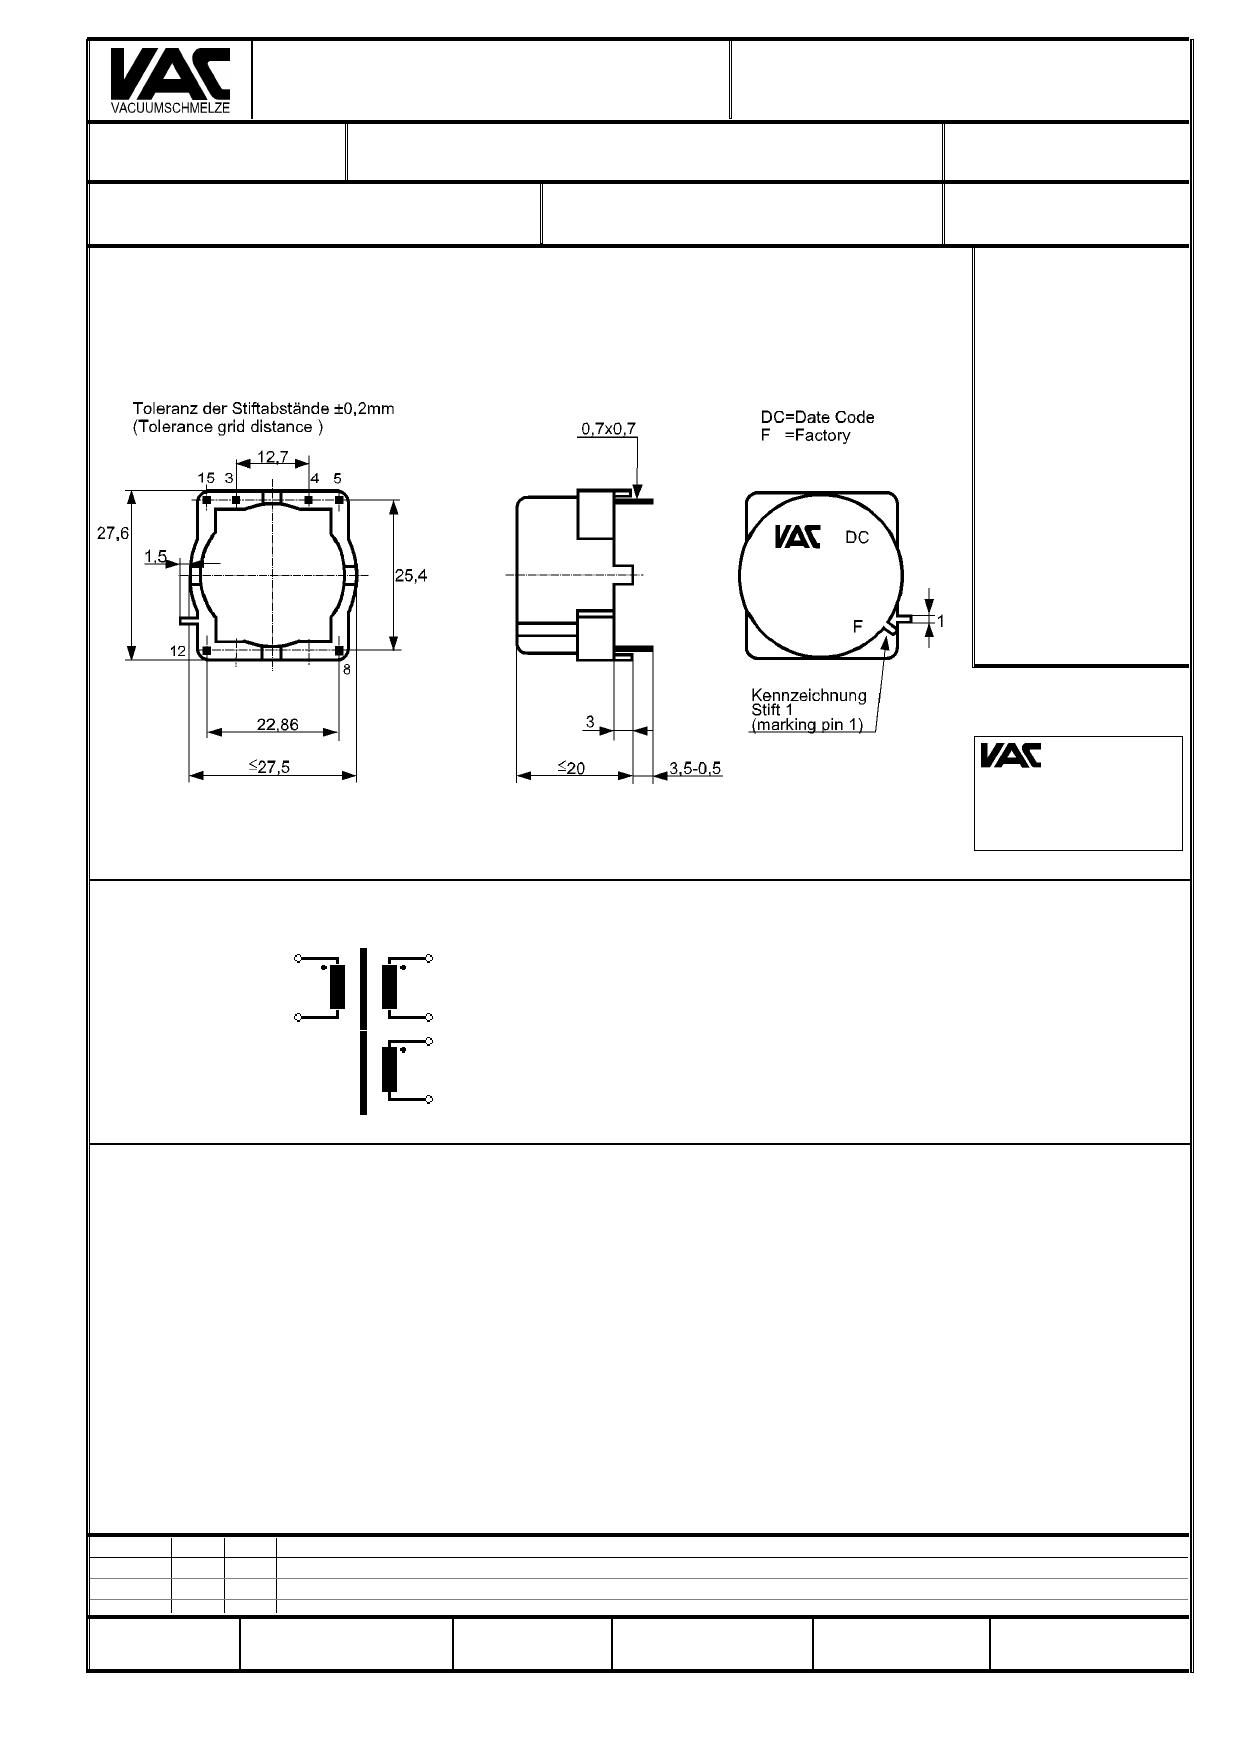 T60403-F4185-X040 datasheet, circuit